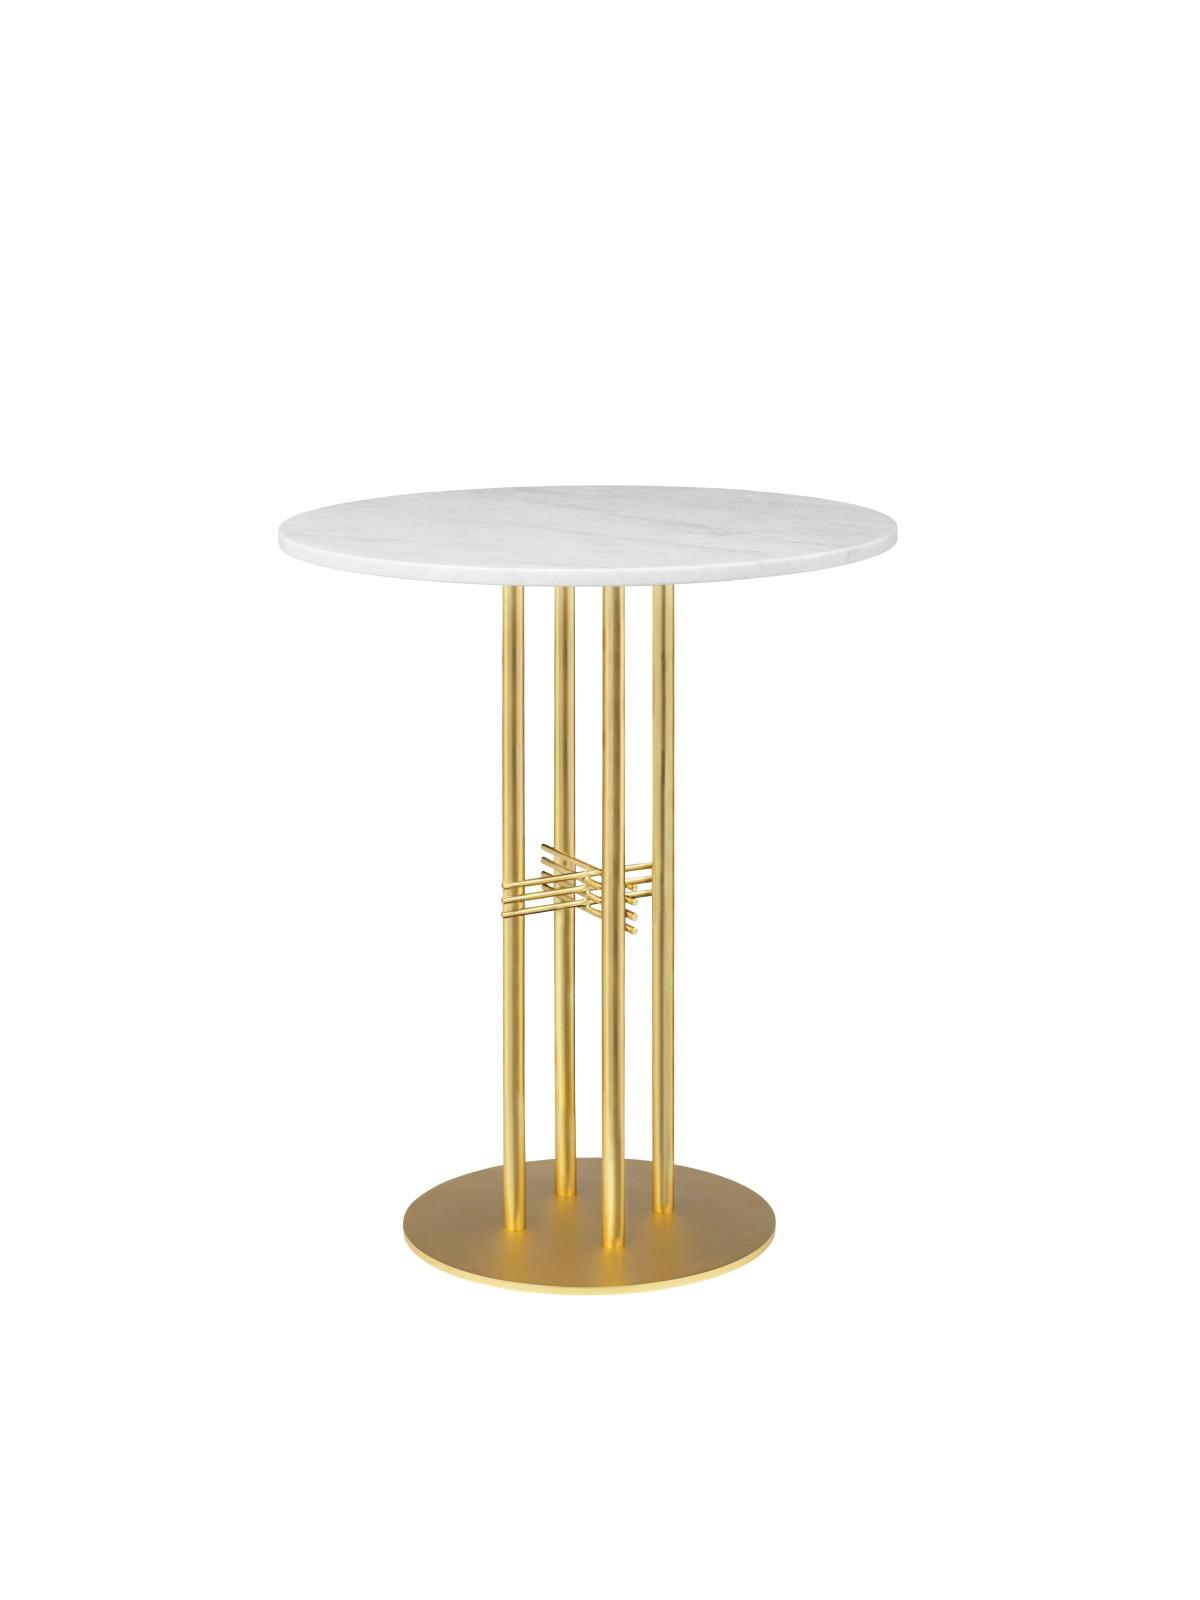 TS Column Bar Table Marble 080, Frame Brass, Gubi Marble Bianco Carrara